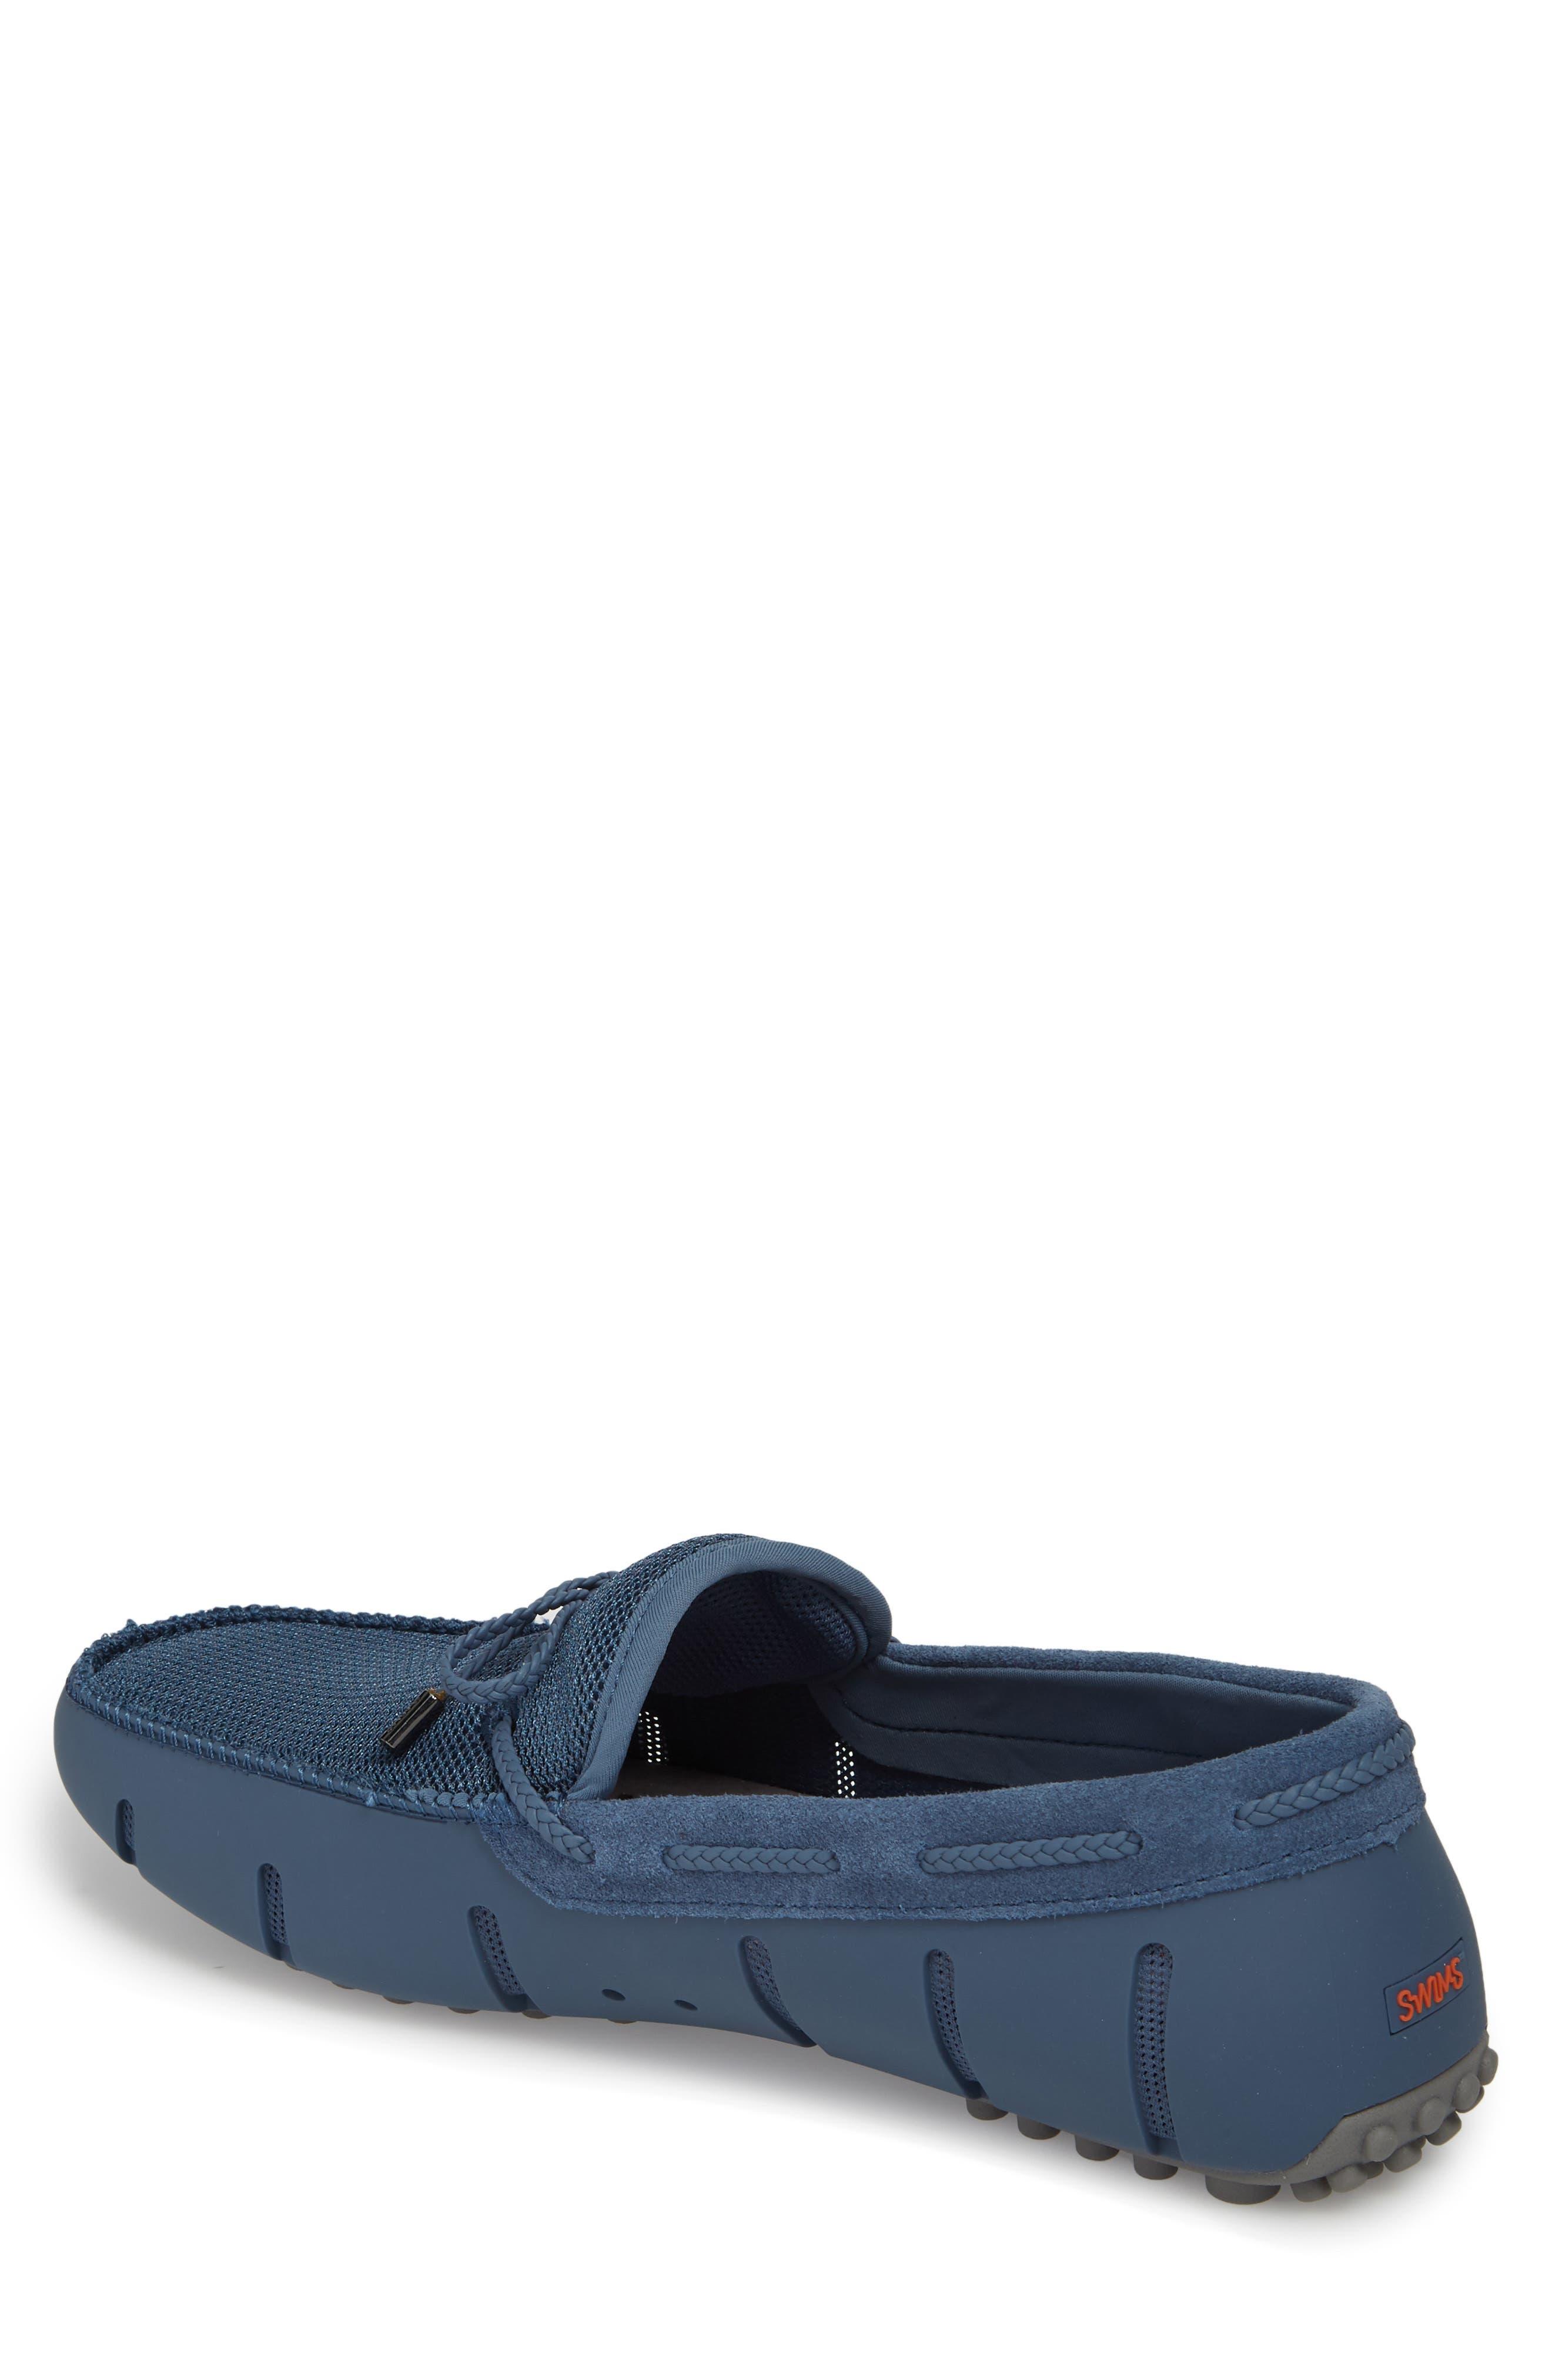 Alternate Image 2  - Swims Washable Driving Loafer (Men)